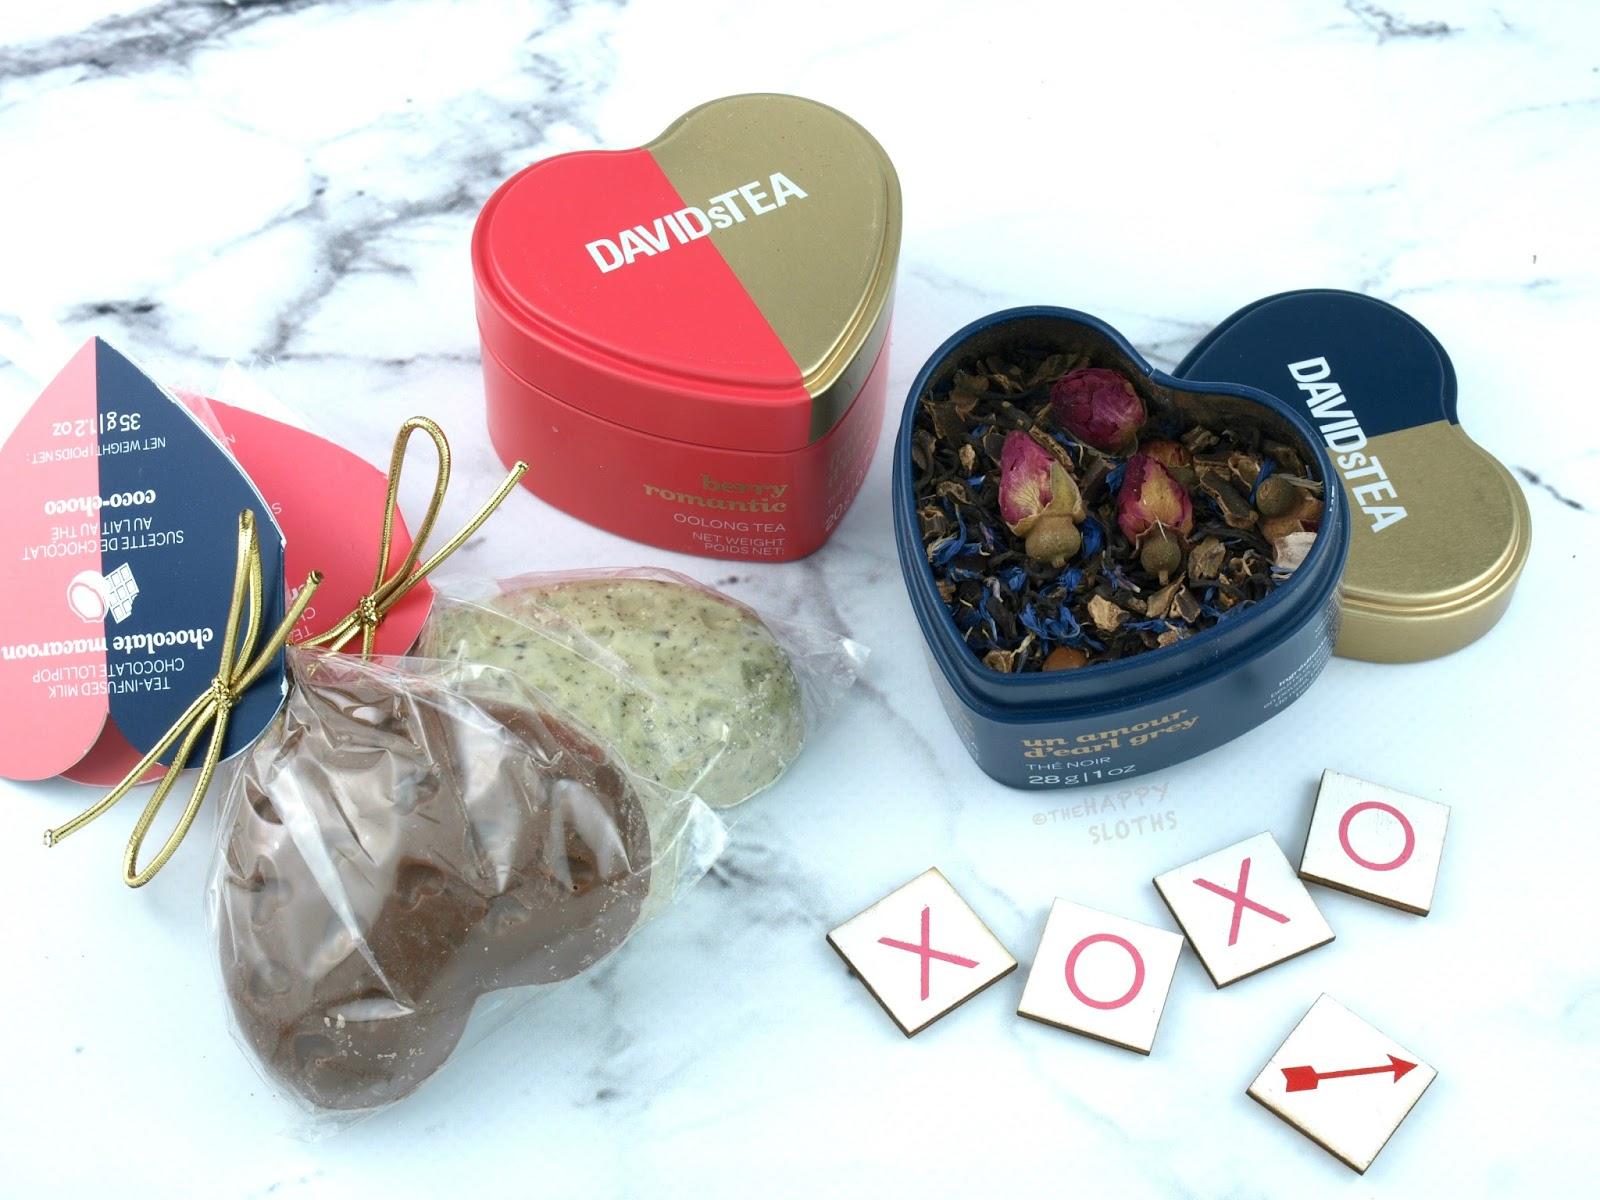 DAVIDsTEA Valentines Day